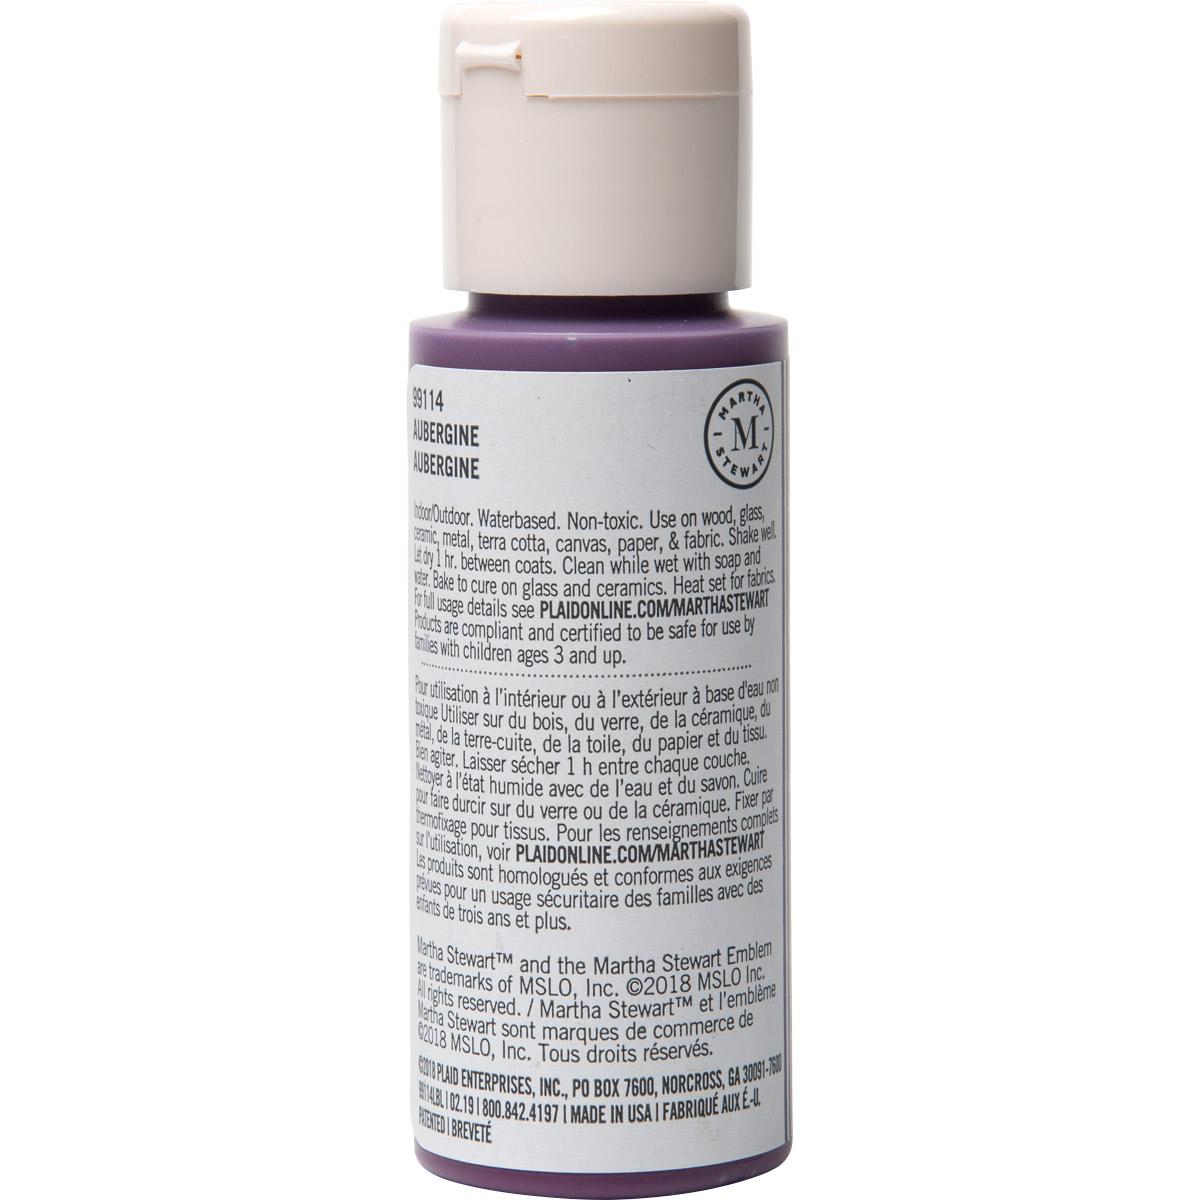 Martha Stewart ® Multi-Surface Satin Acrylic Craft Paint CPSIA - Aubergine, 2 oz. - 99114